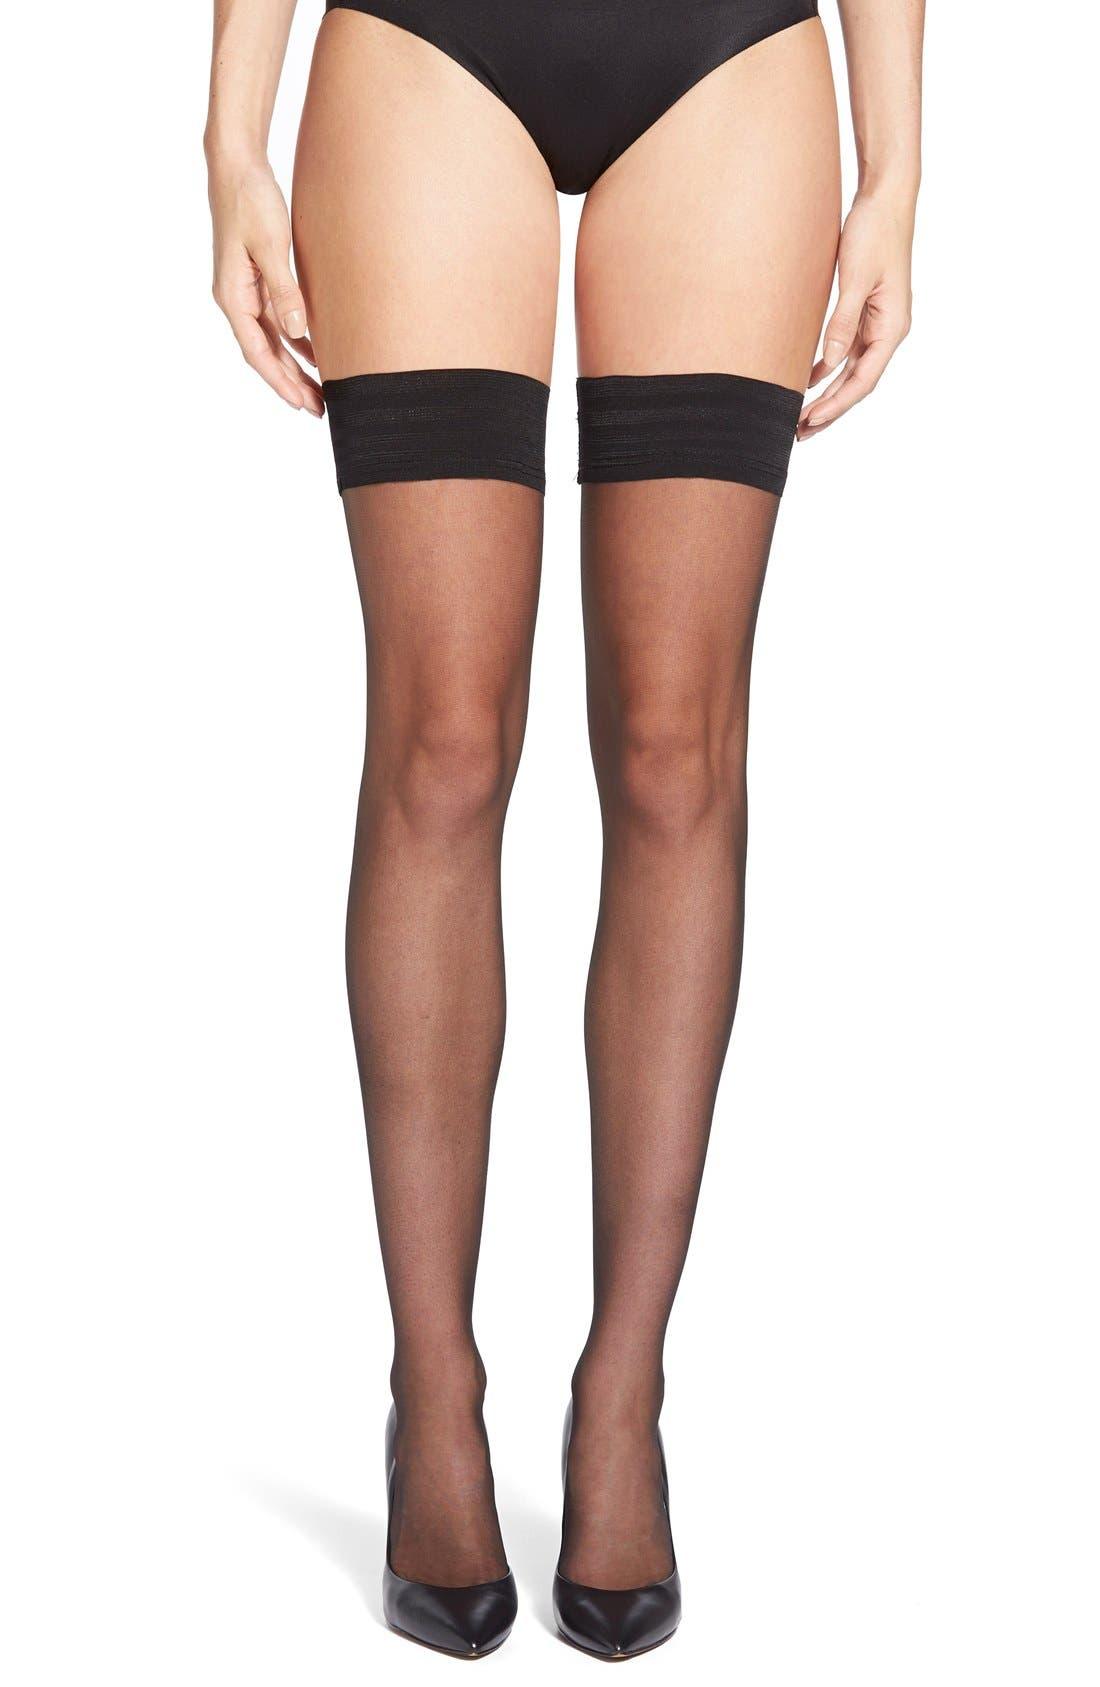 Alternate Image 1 Selected - Calvin Klein Thigh High Stockings